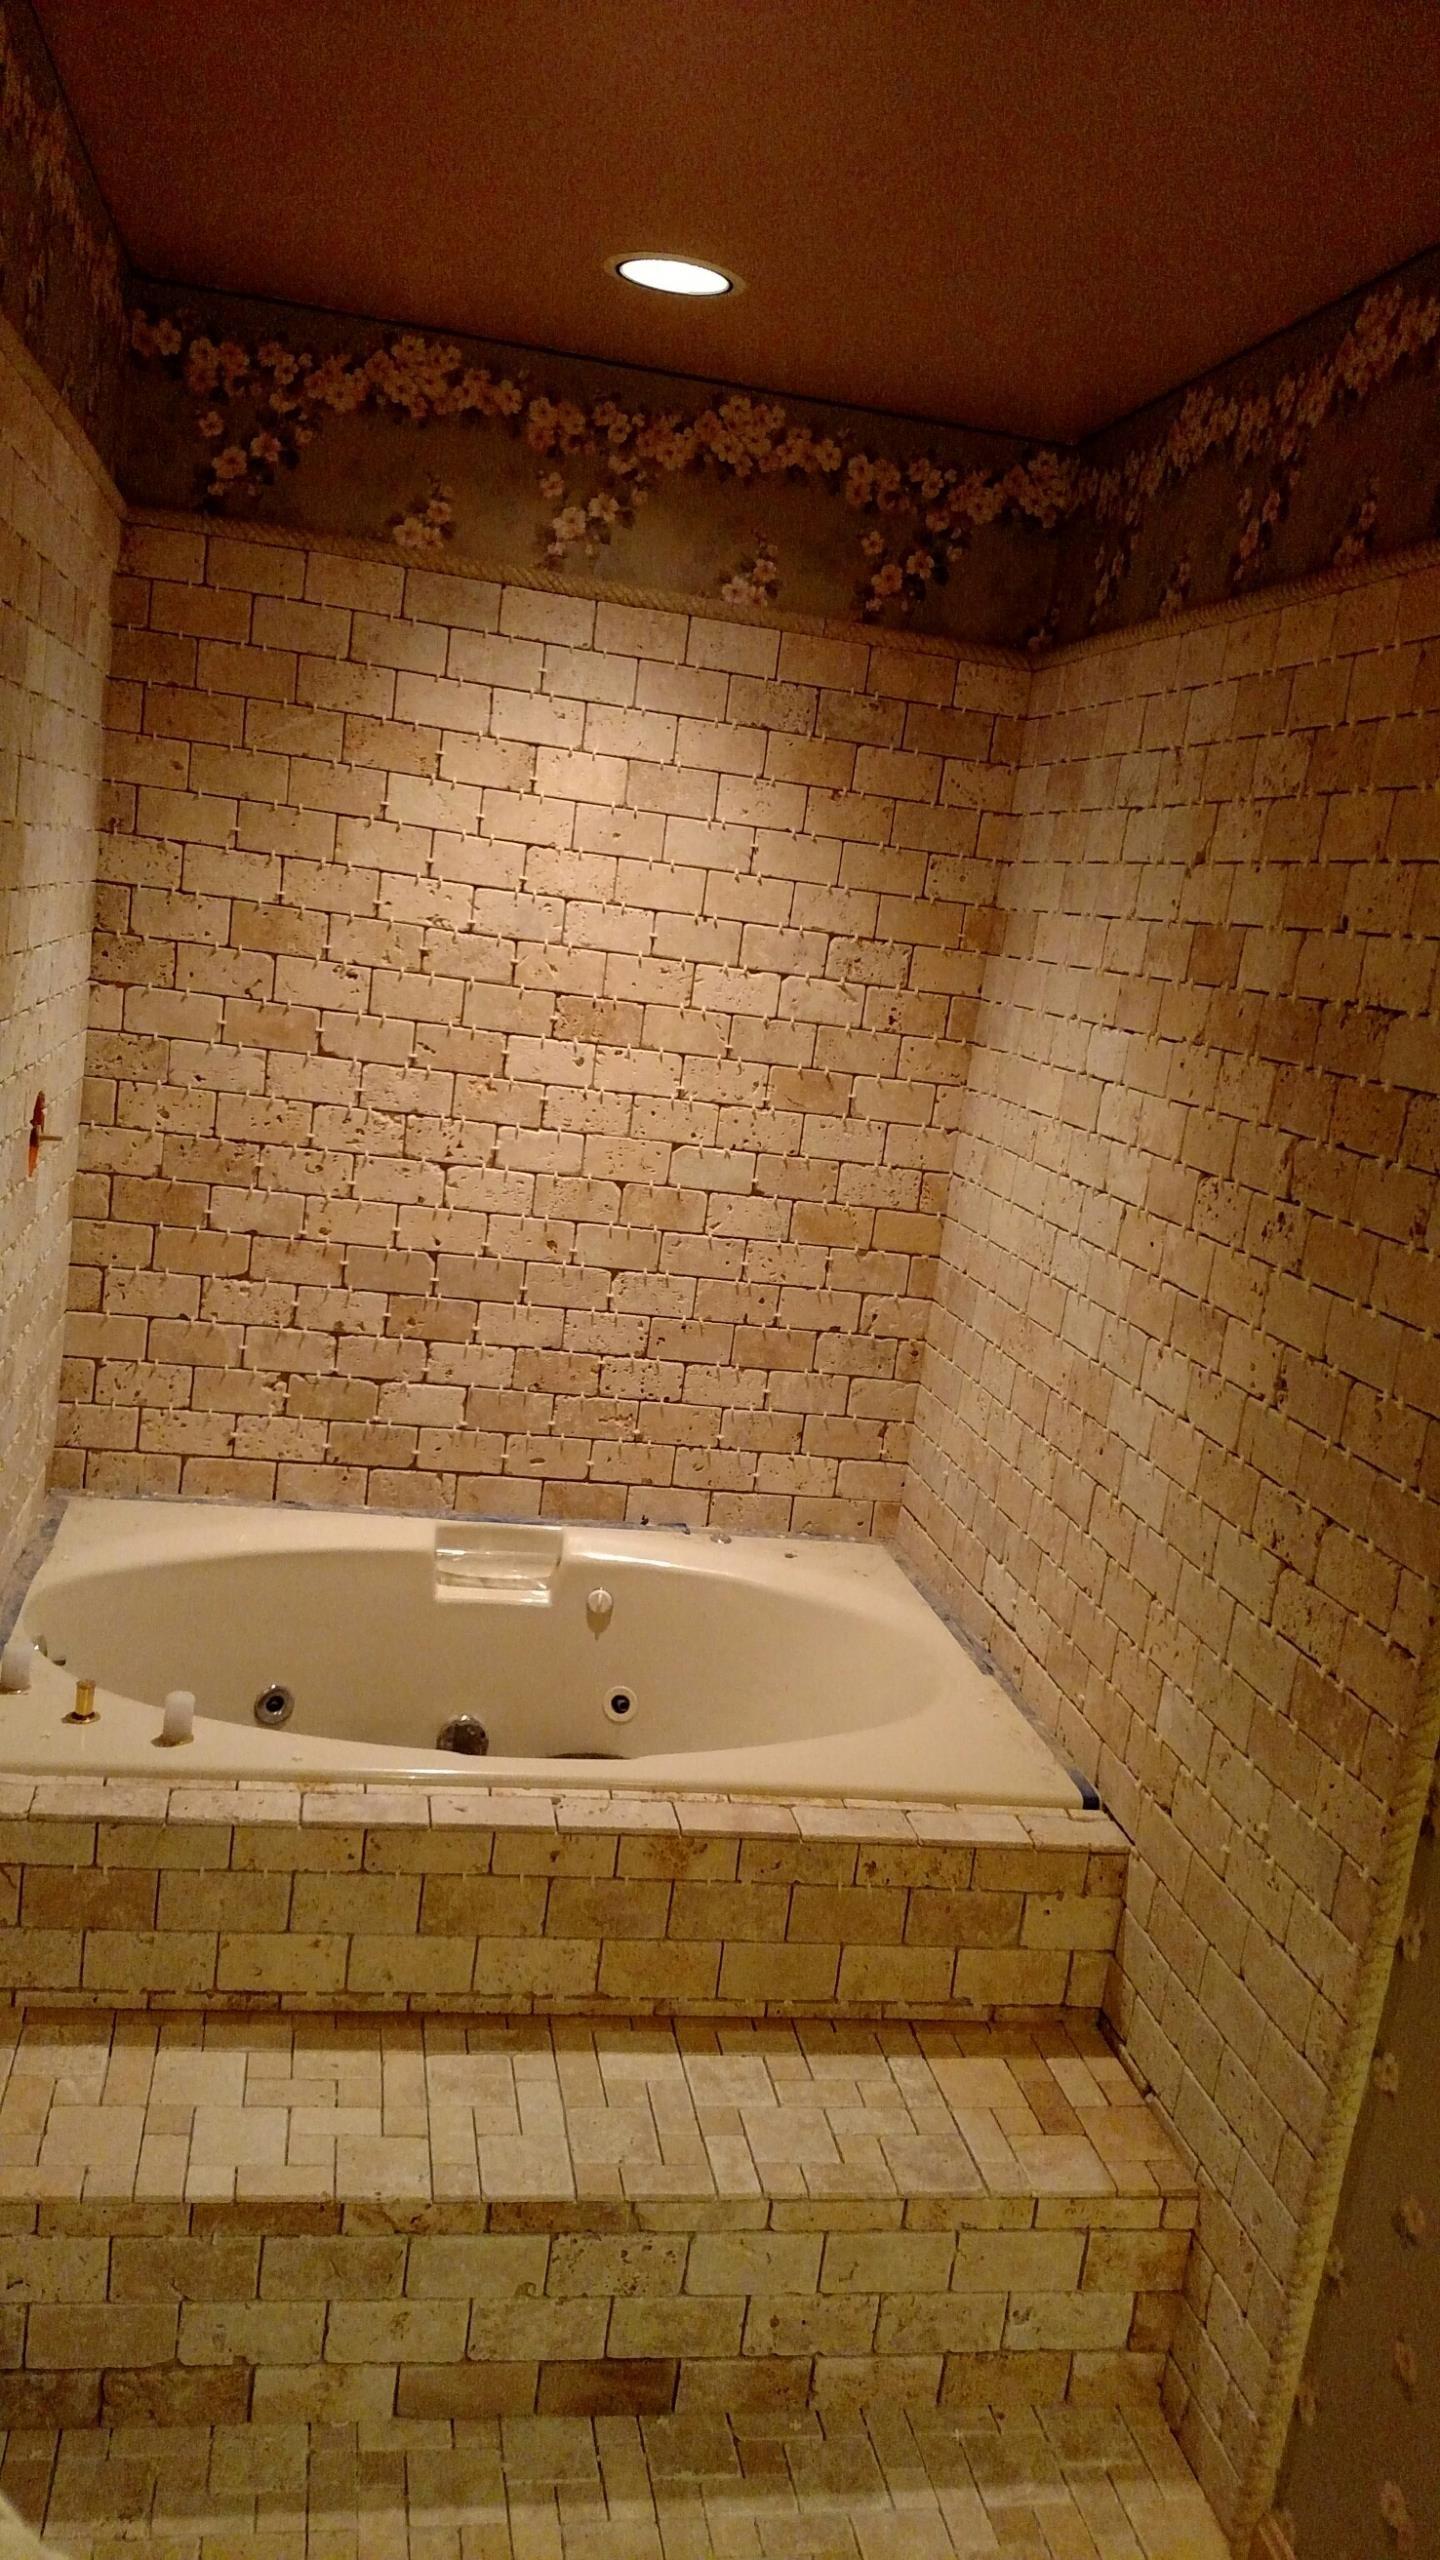 Tile Tub And Showerbathroom Remodelsundance Homes Llc Extraordinary Maryland Bathroom Remodeling Review